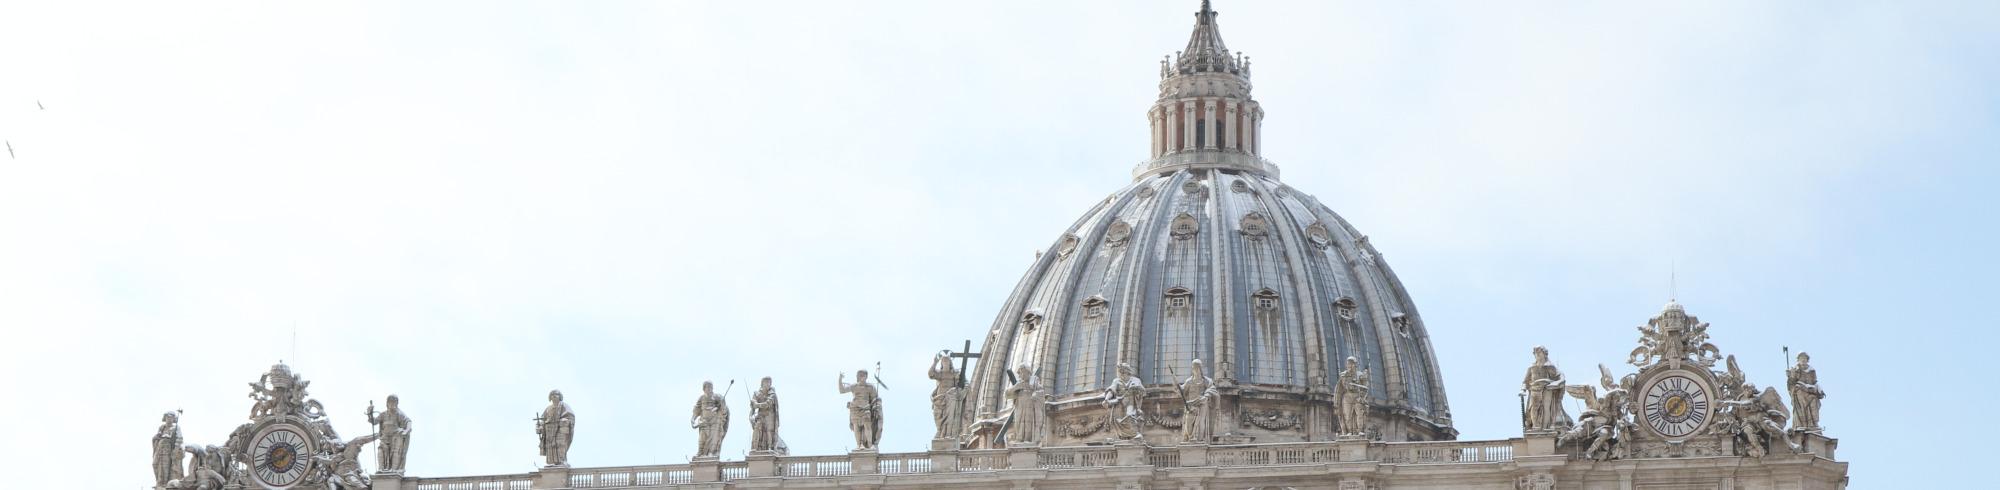 Basilica San Pietro